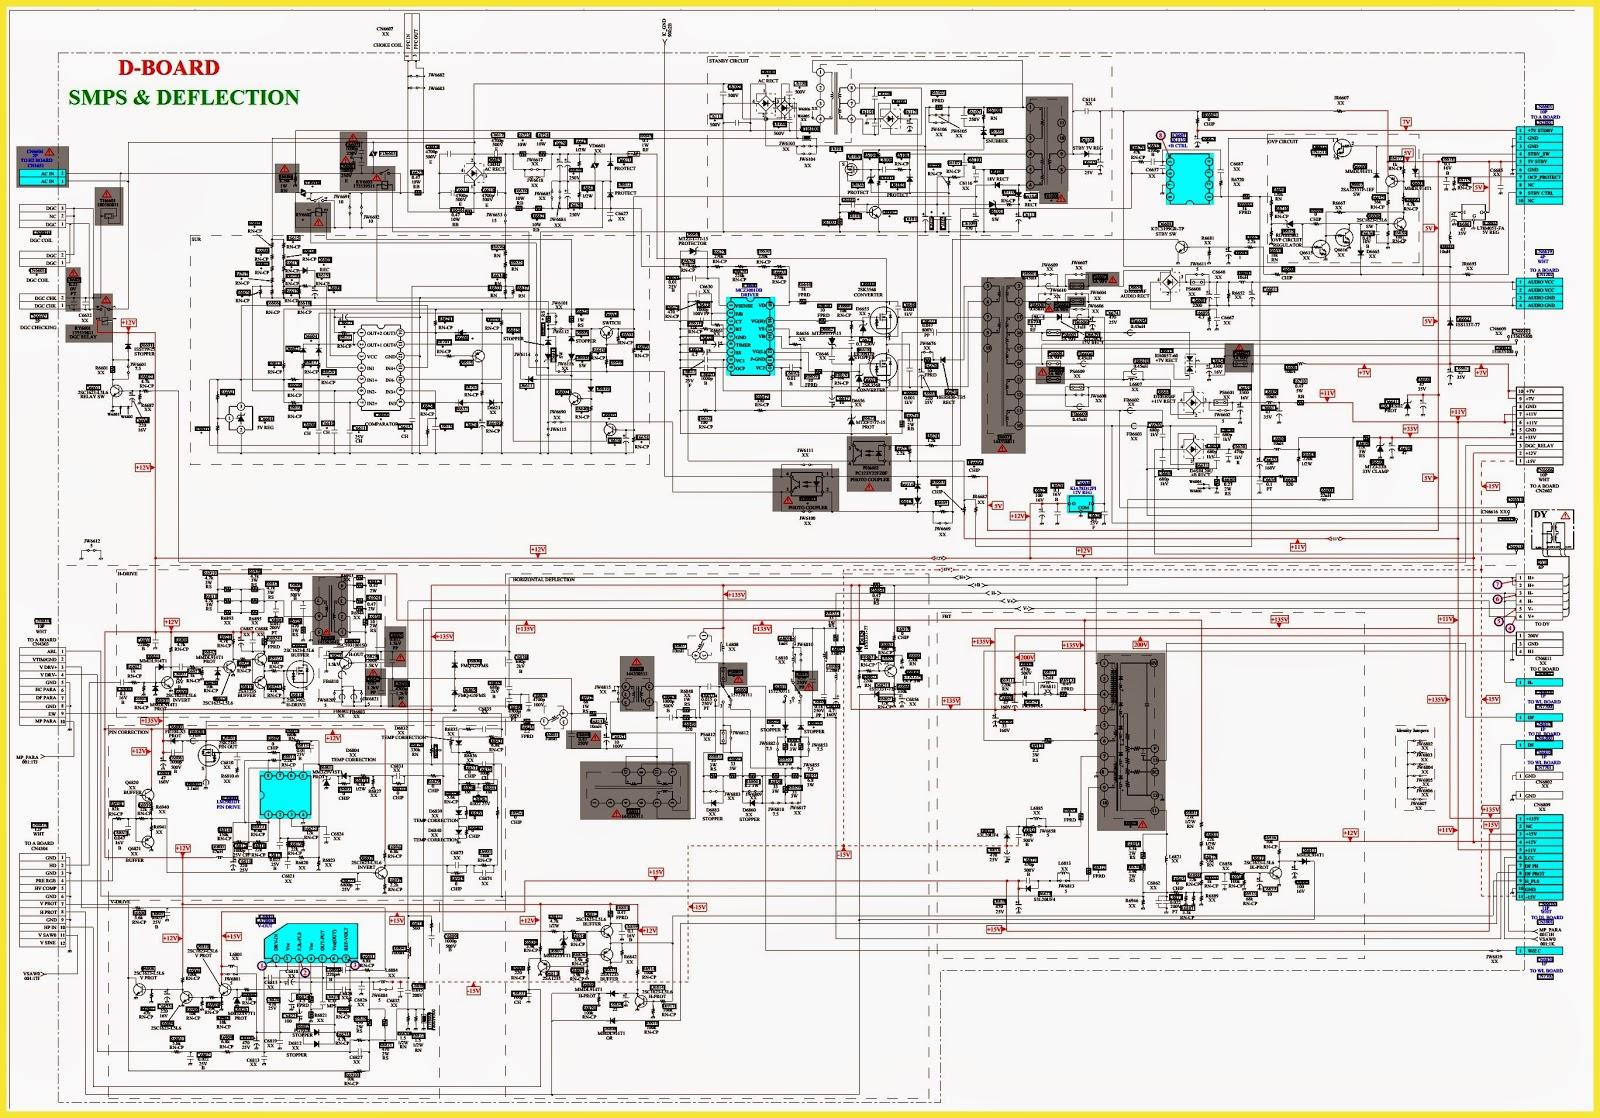 samsung dvd wiring diagram wiring library samsung usb cable wiring diagram samsung dvd wiring diagram [ 1600 x 1118 Pixel ]